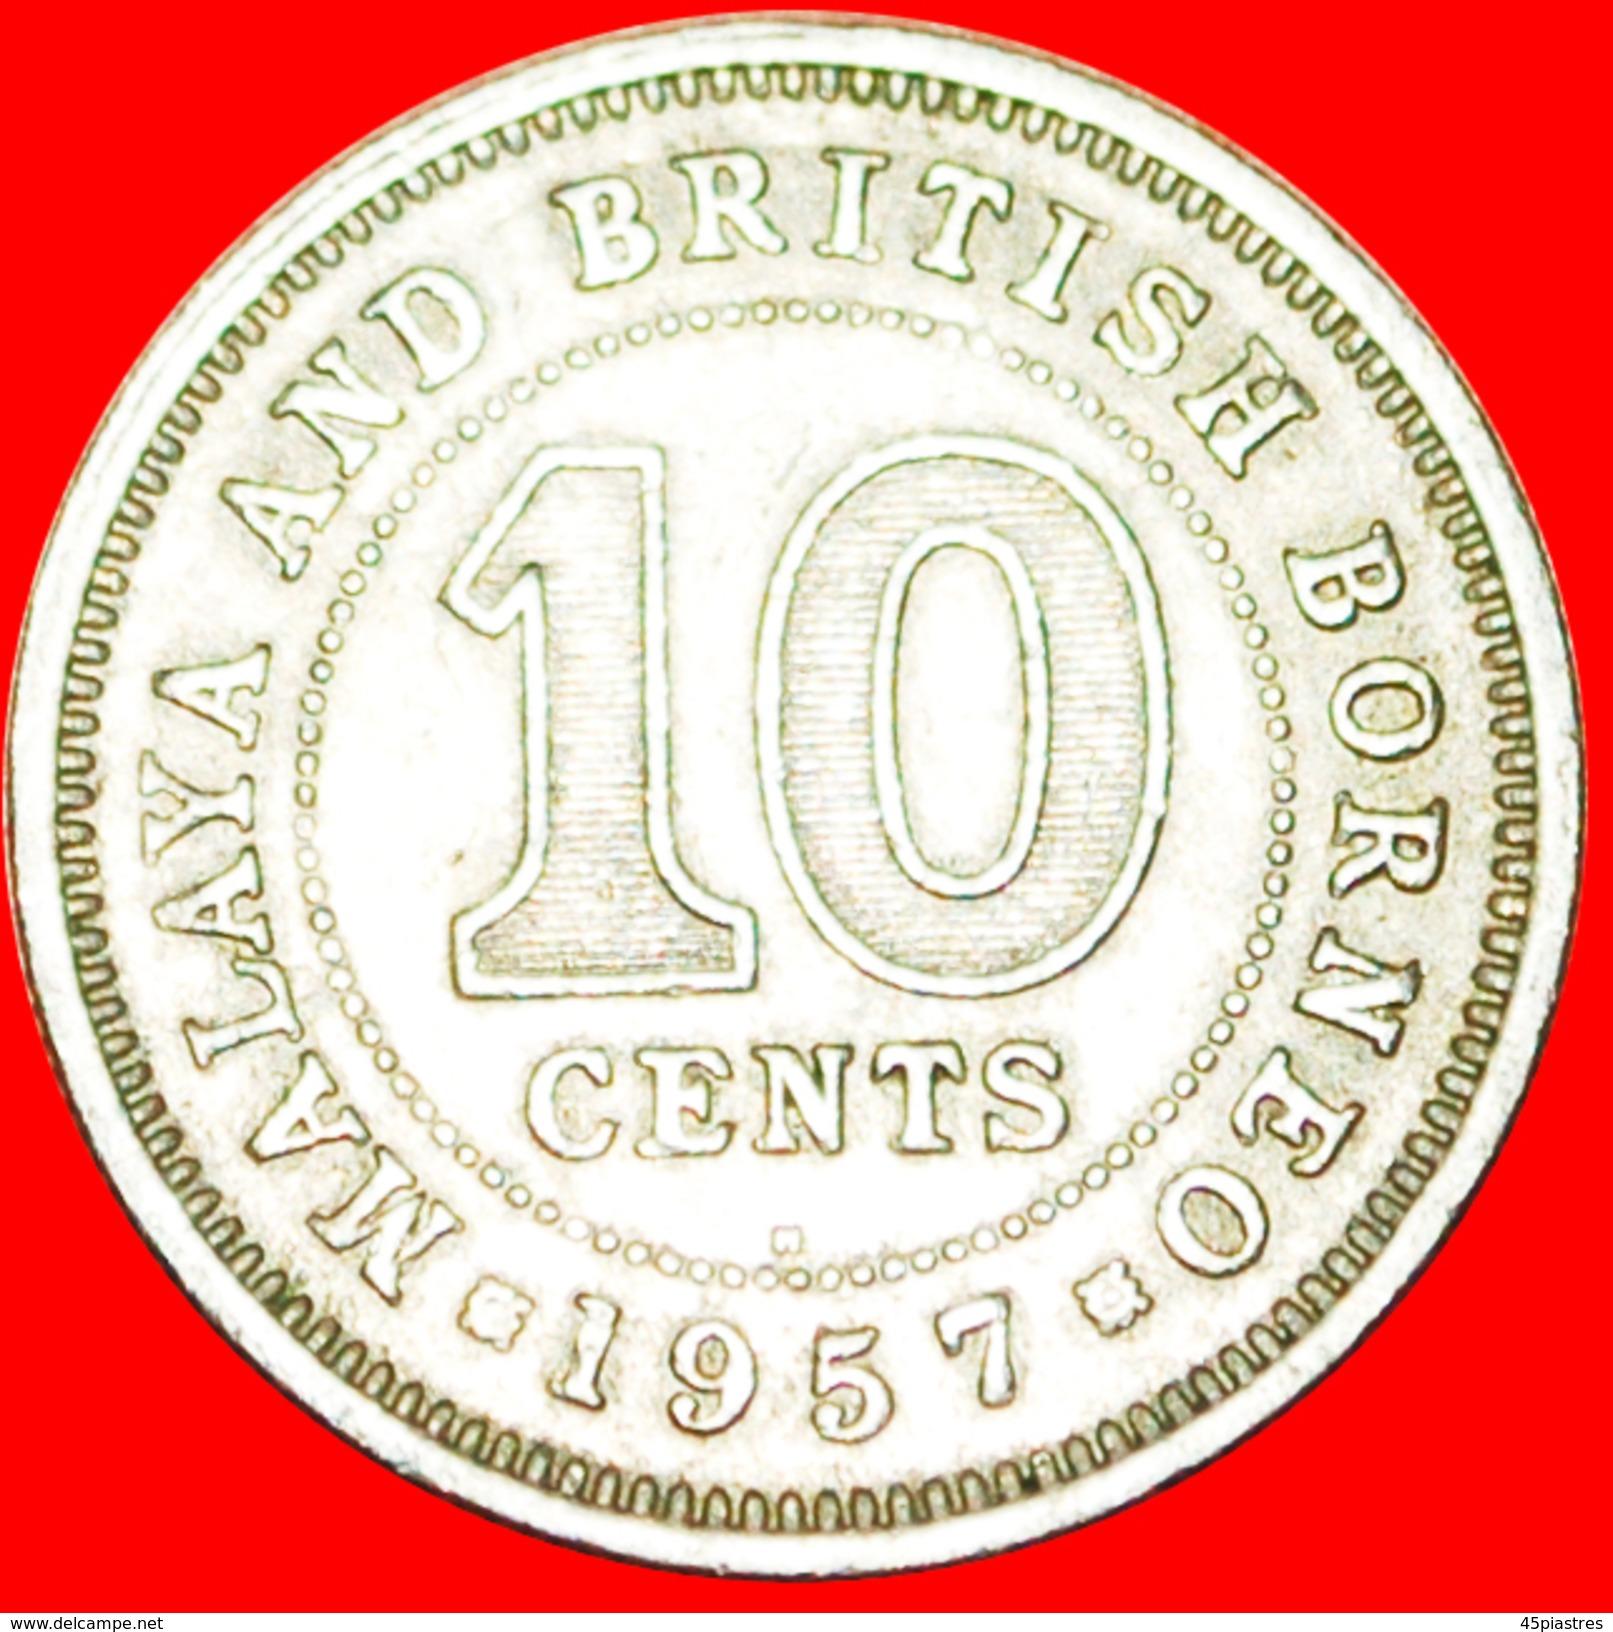 § GREAT BRITAIN: MALAYA AND BRITISH BORNEO ★ 10 CENTS 1957H! LOW START★ NO RESERVE! - Malaysie